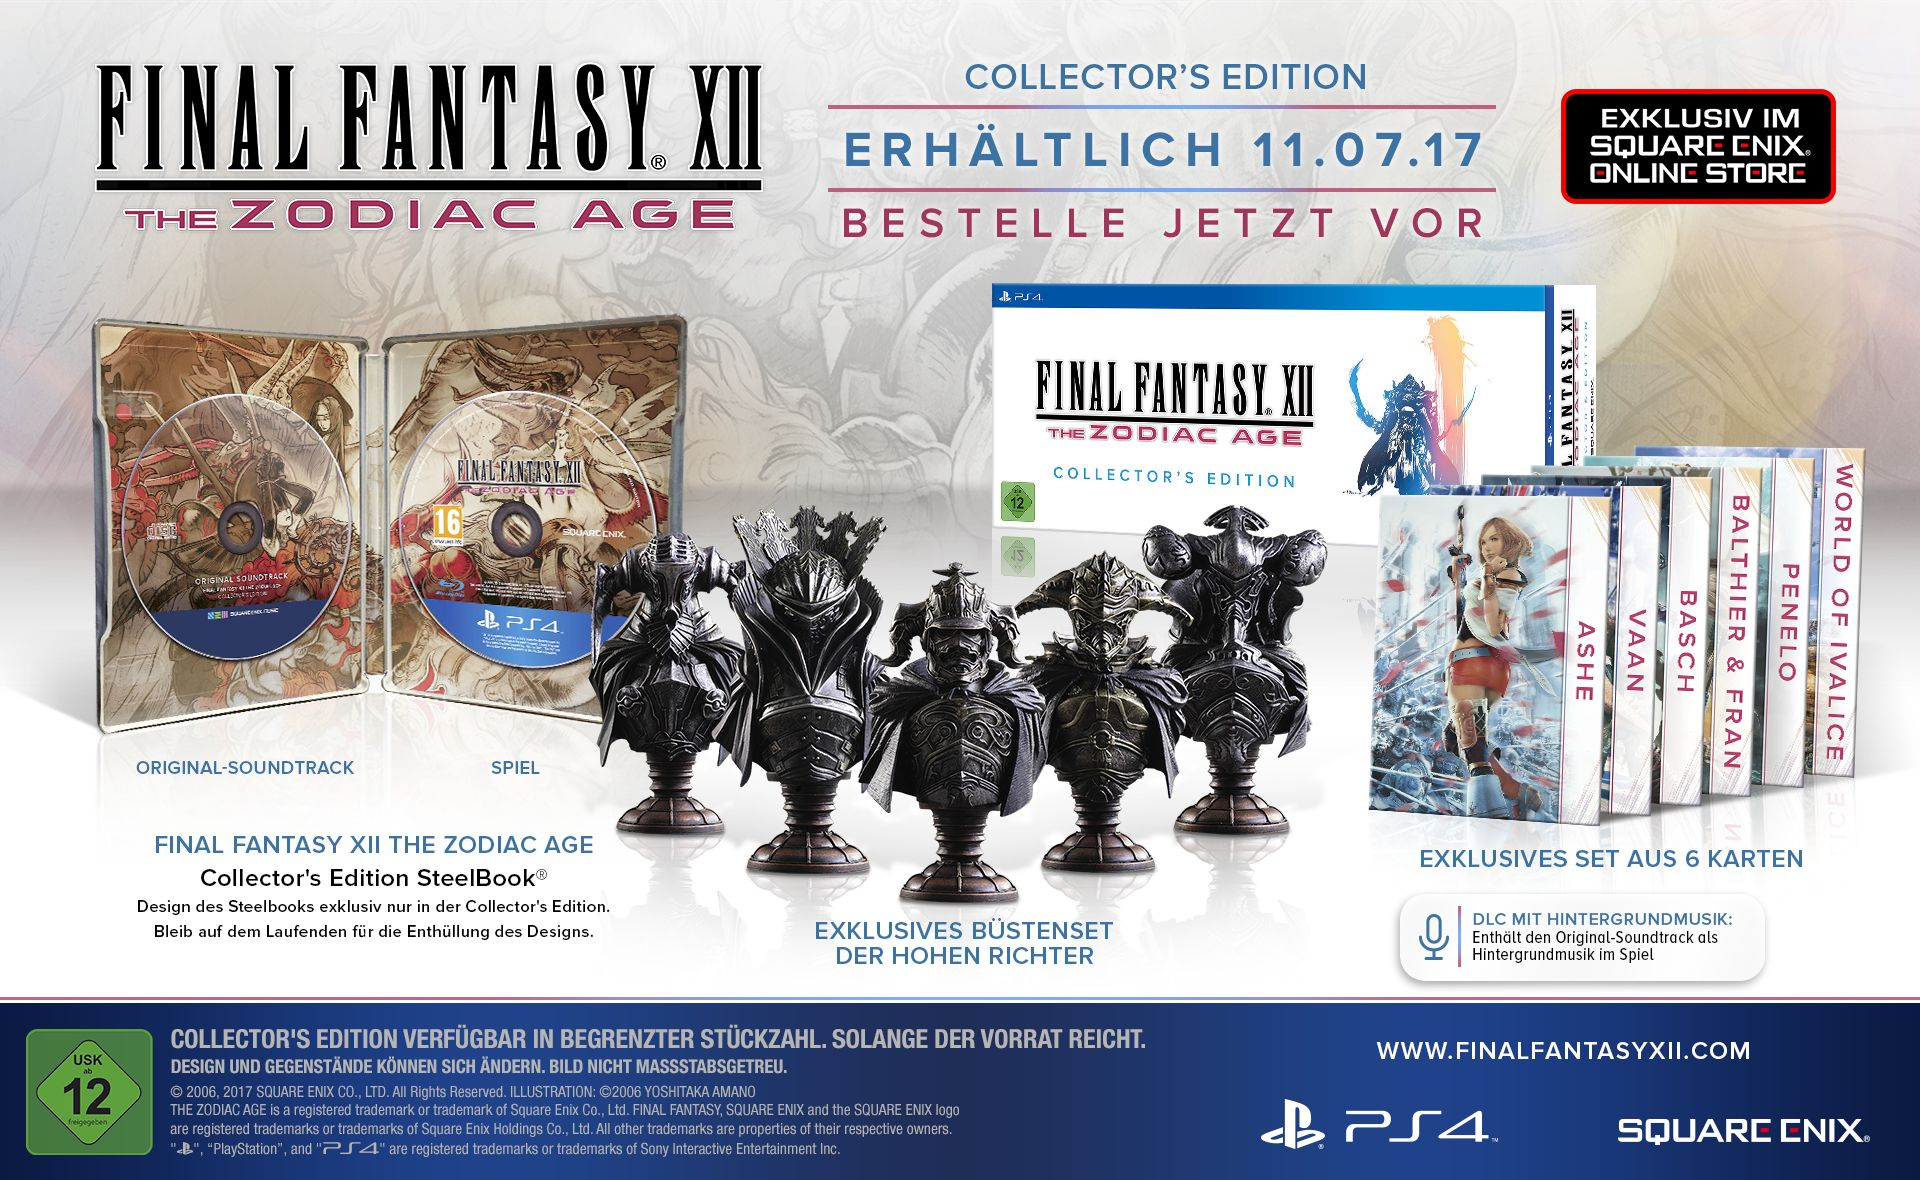 final-fantasy-xii-the-zodiac-age_ce_beautyshot_de